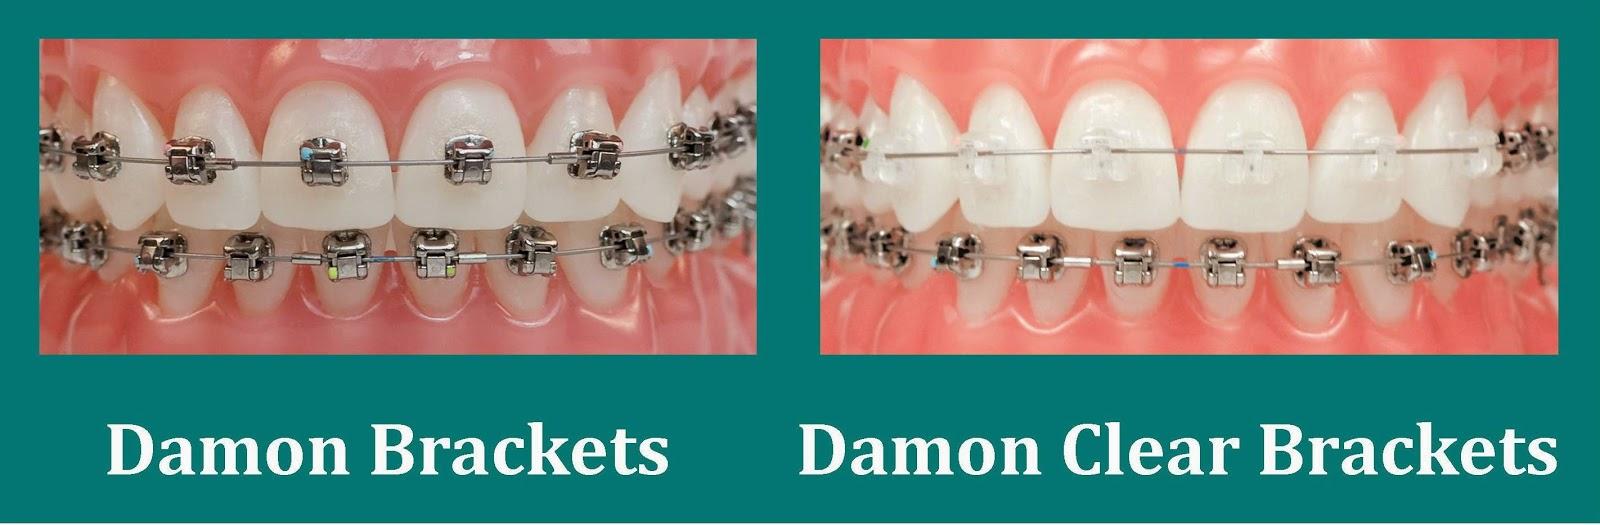 Damon metal braces and Damon clear braces